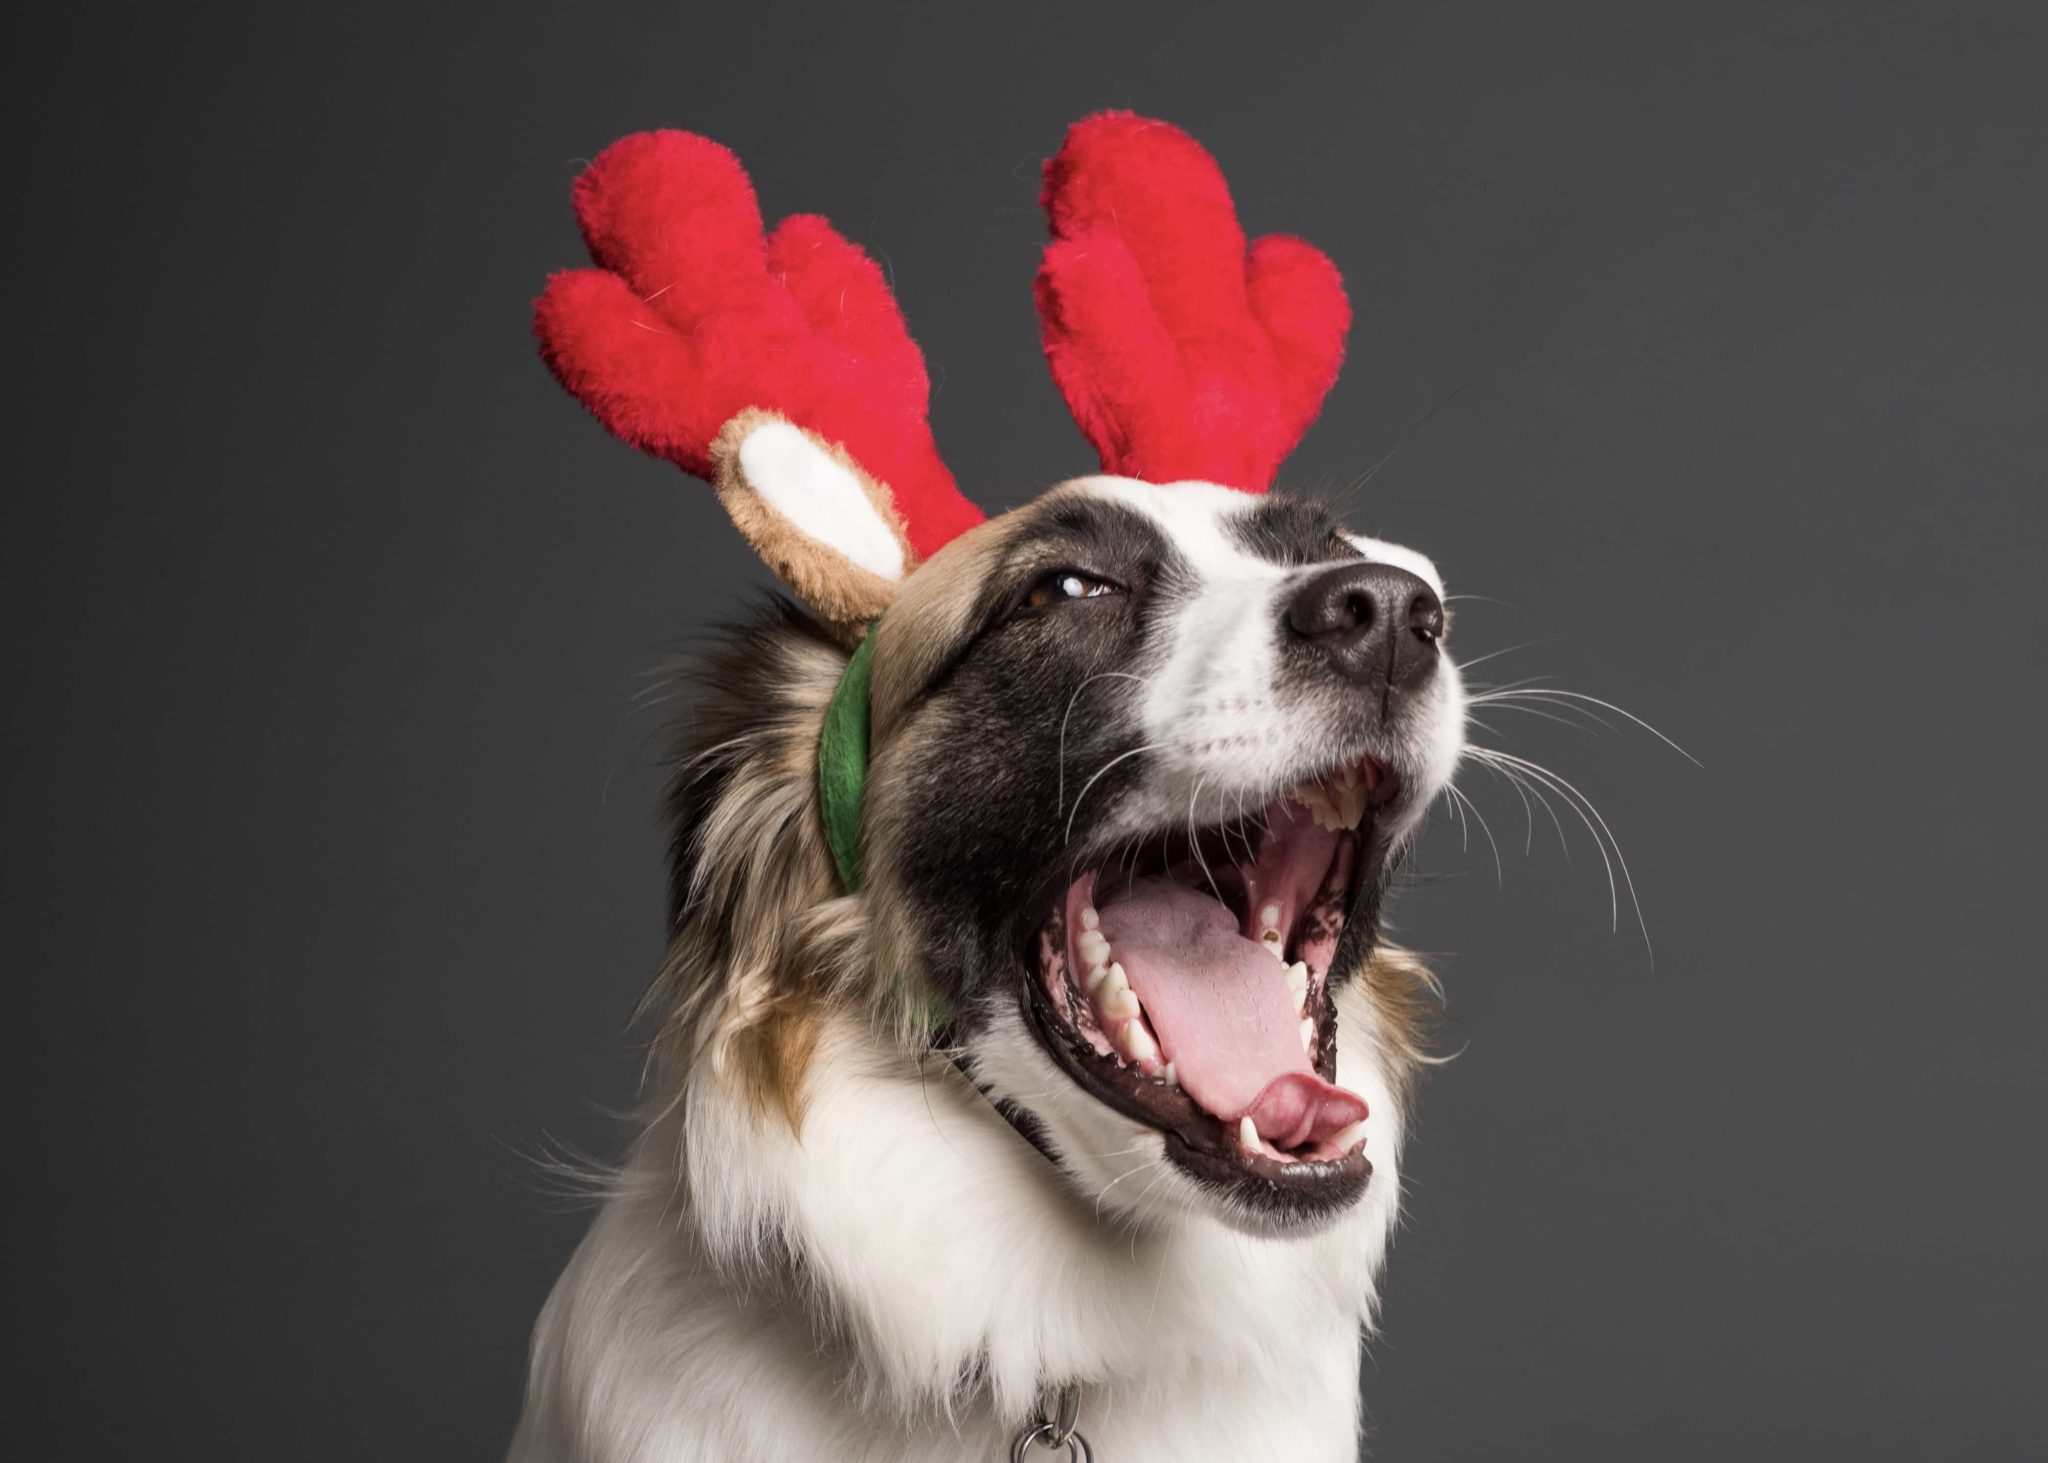 Dog with reindeer ears